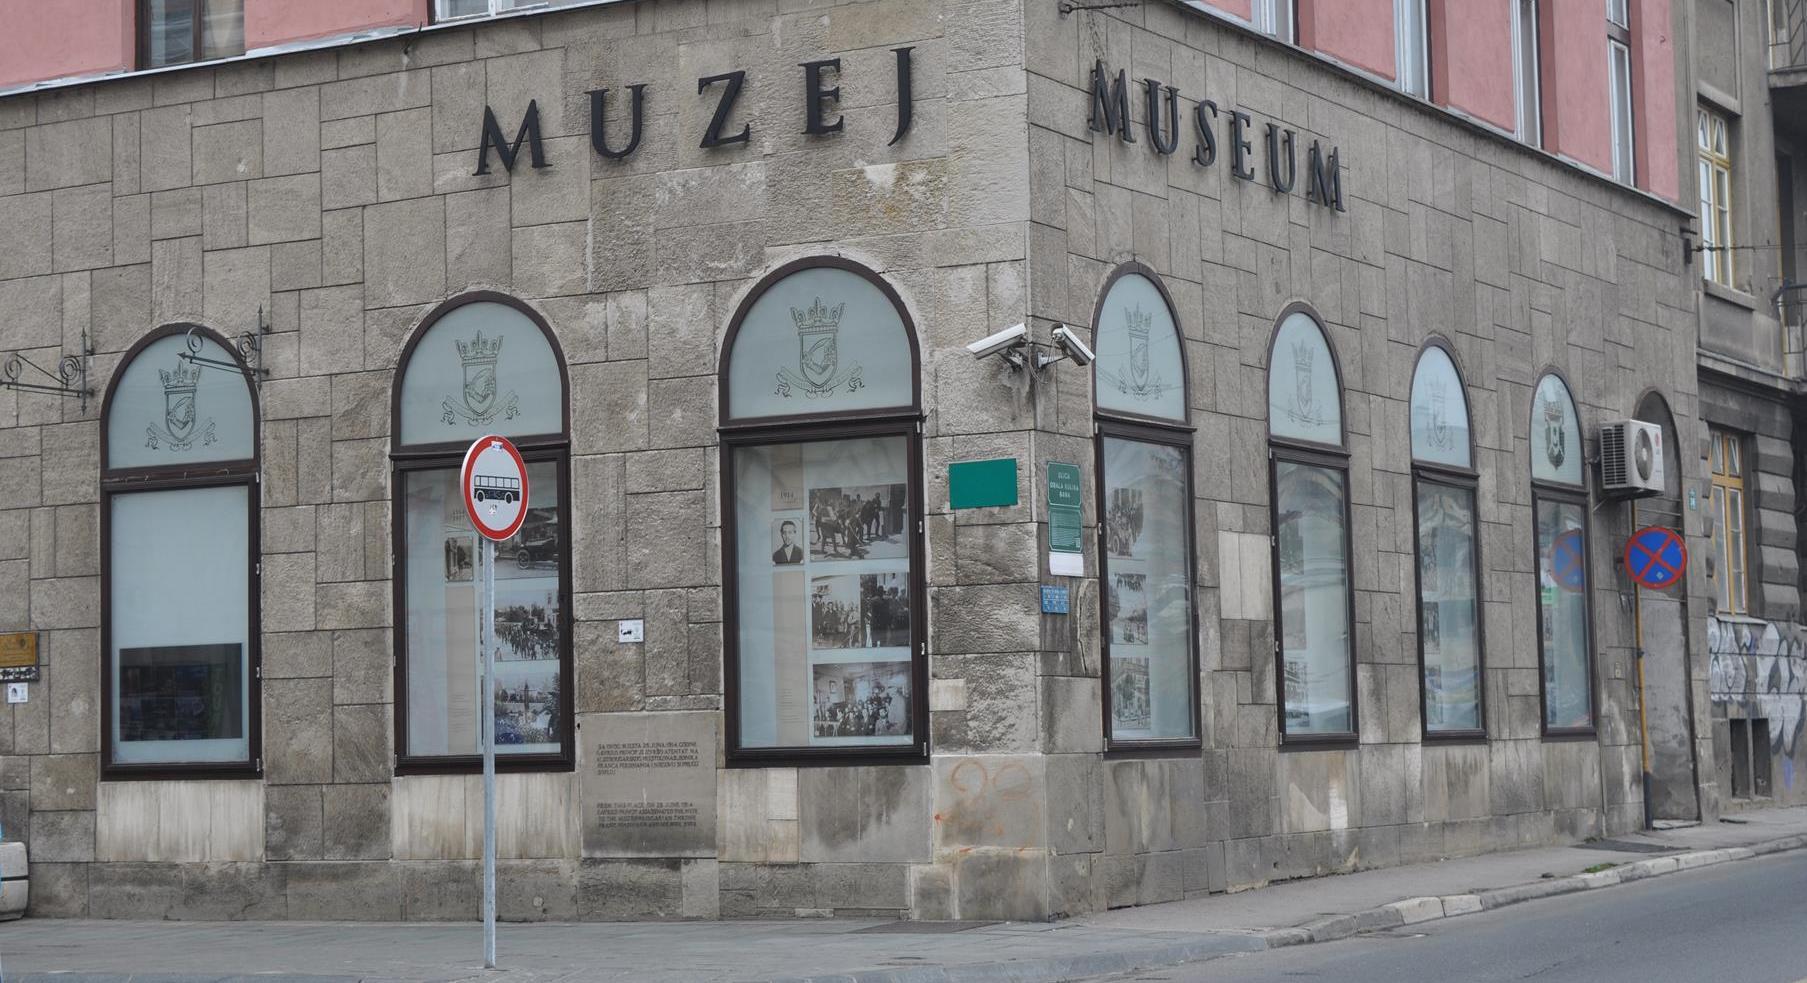 museum. sarajevo, 1914, assassination of franz ferdinand, franz ferdinand, balkans, bosnia and herzegovina, travel, WWI